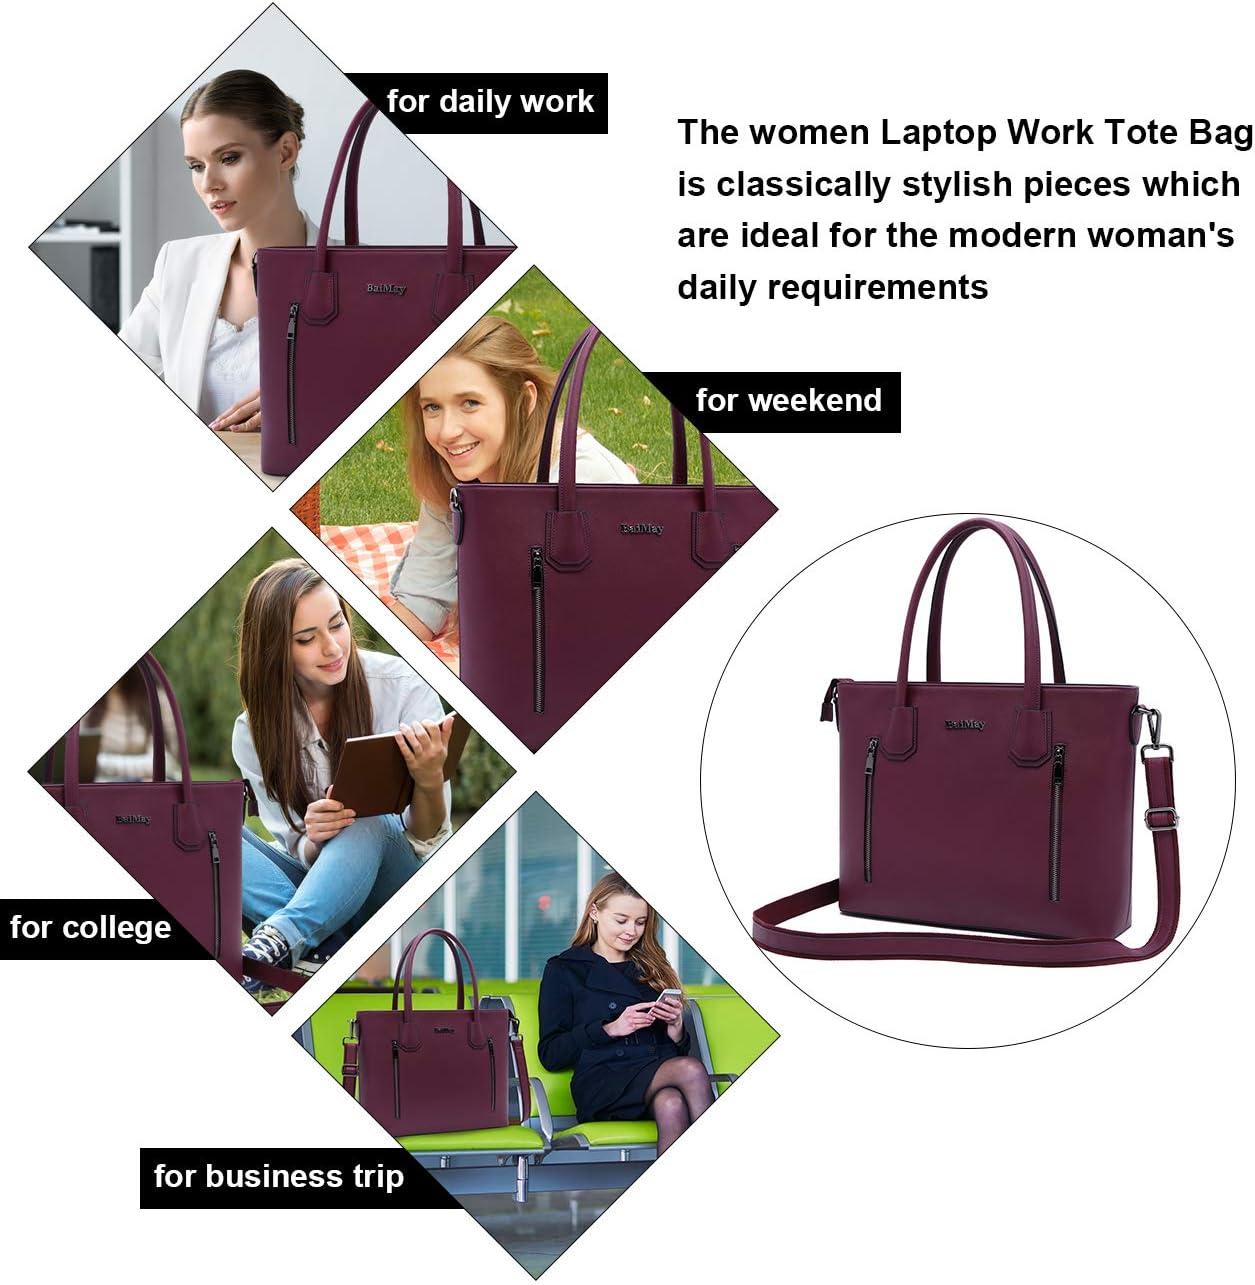 BAIMAY Laptop Bag,15.6 Inch Tote Bag Briefcase with Multi-Pocket Laptop Shoulder Bag Business Handbags Work Tote Bag Large Computer Purse with Padded Pocket for Women